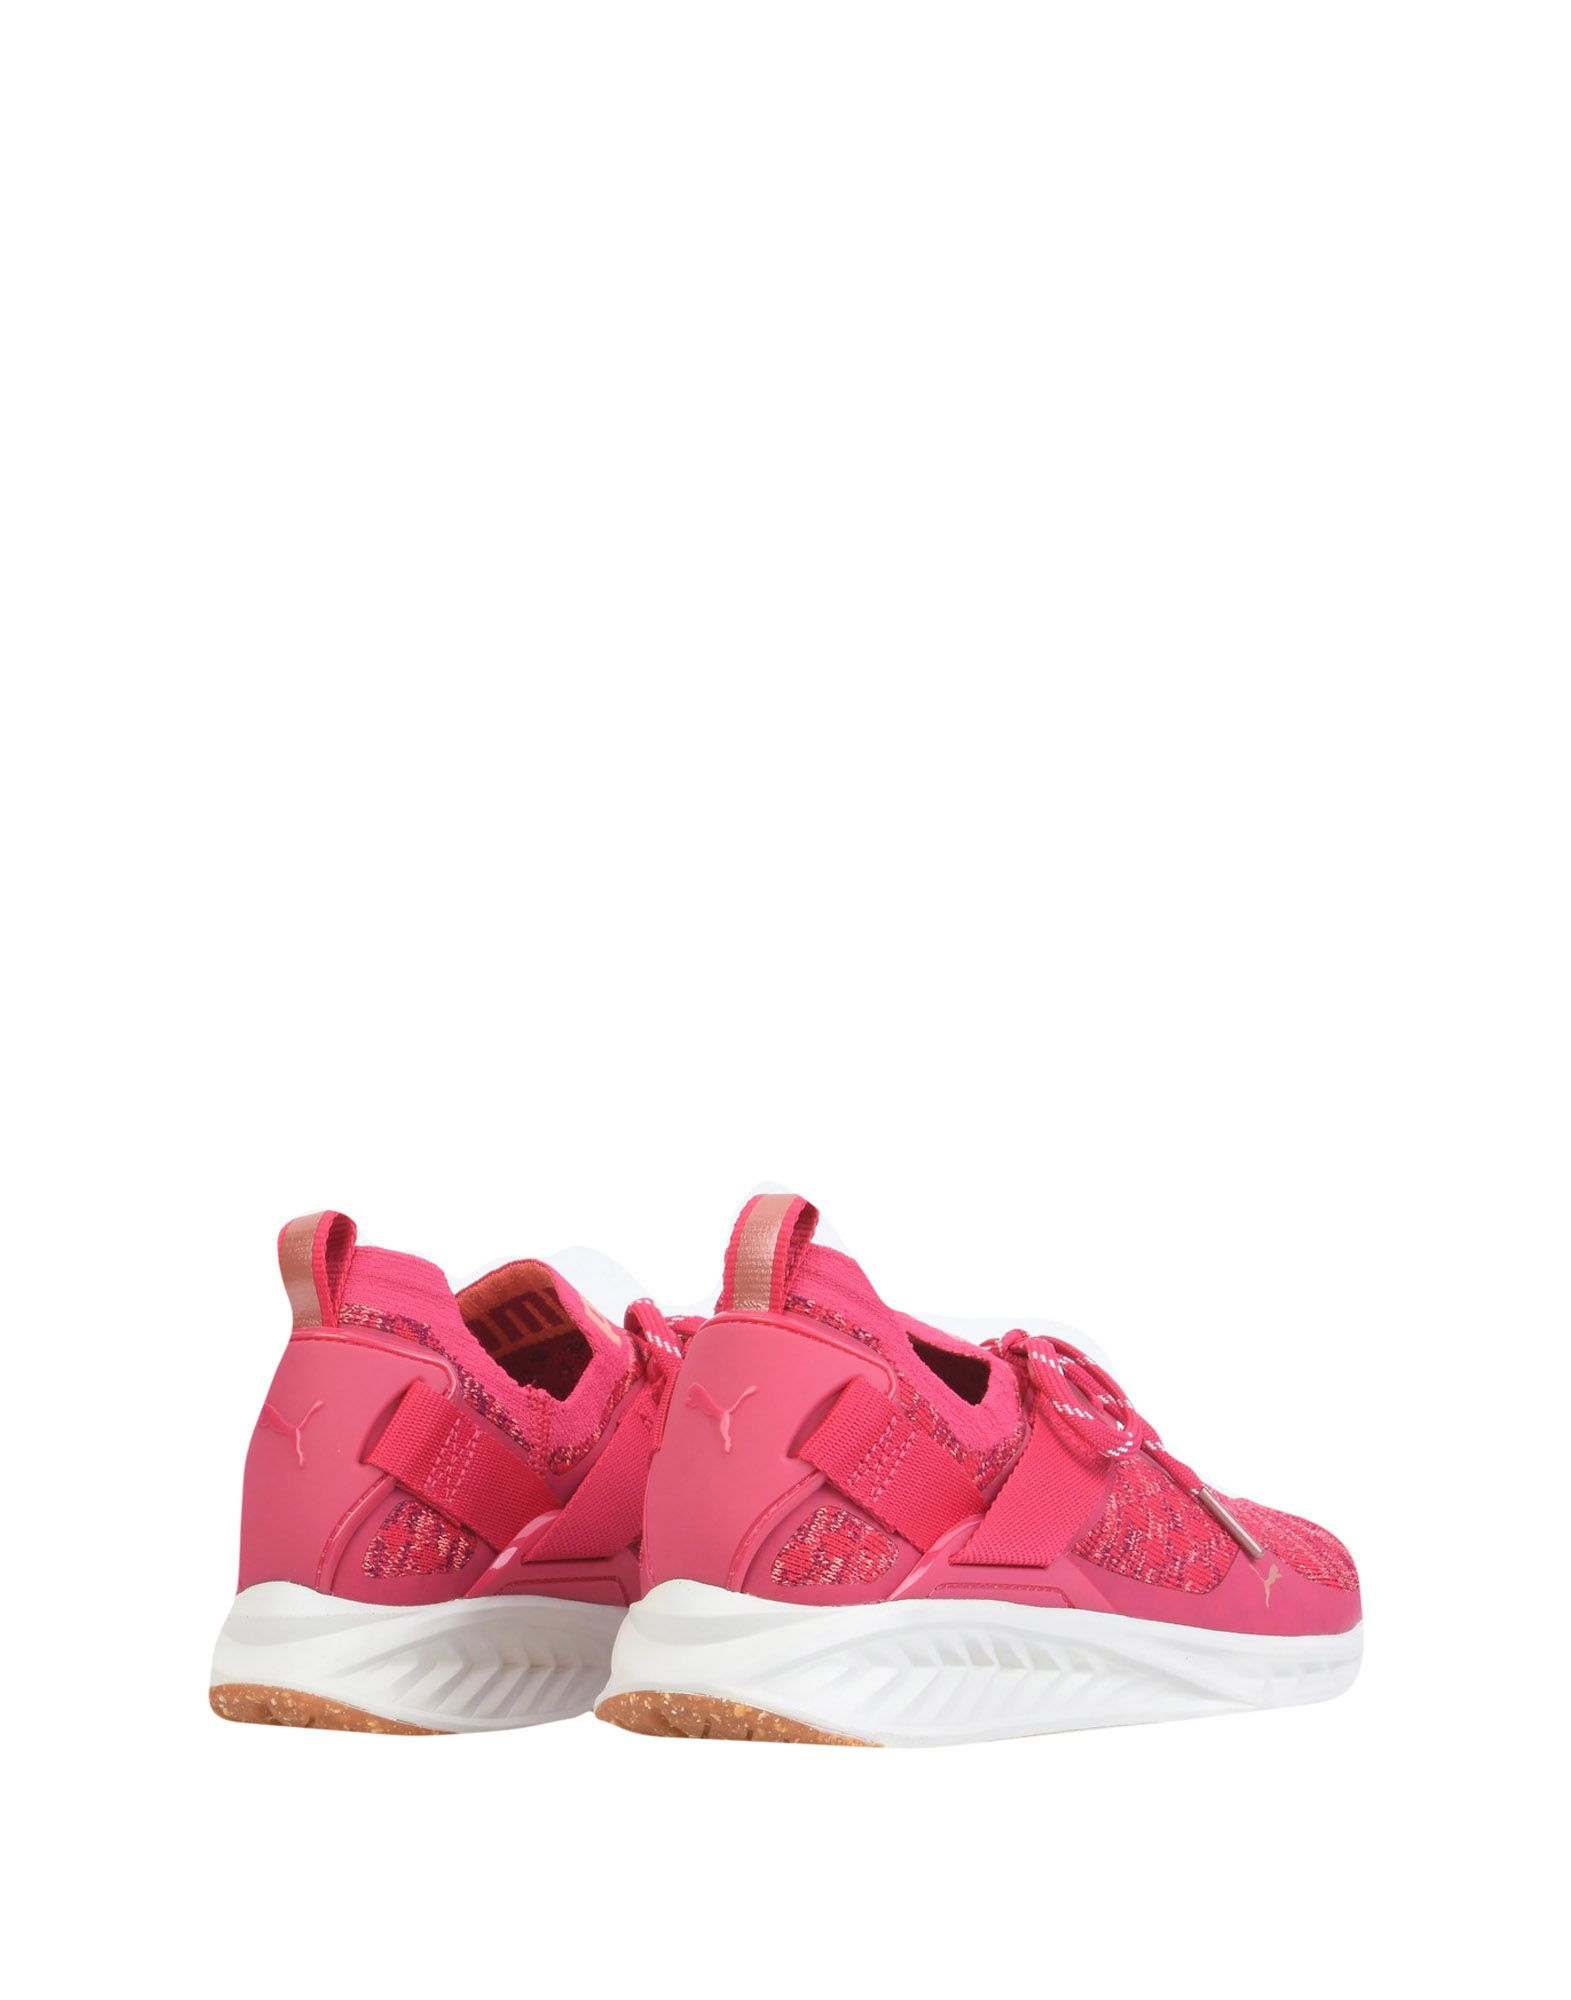 Puma Ignite Evoknit Lo Lo Lo Vr Wn's - Sneakers - Women Puma Sneakers online on  United Kingdom - 11318885KI 6bec13